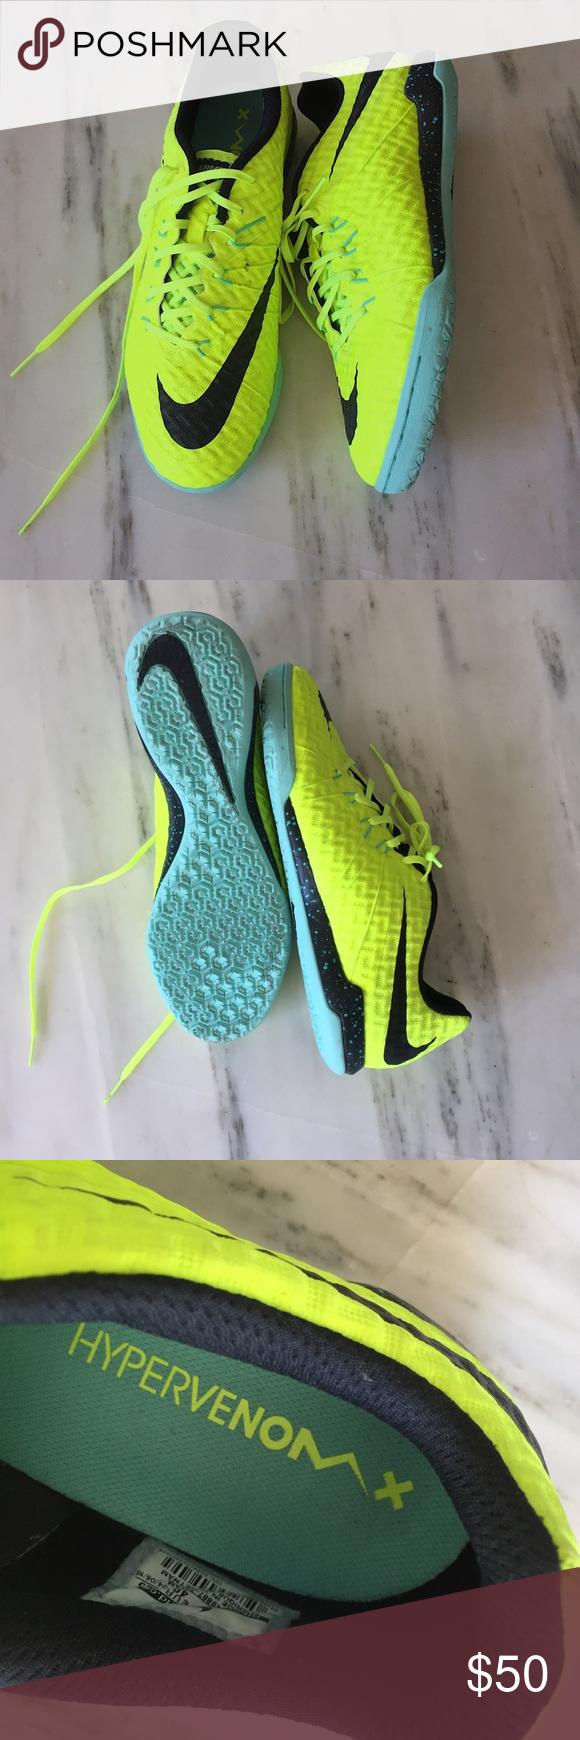 Neon Nike Hypervenom Sneakers Neon Nike Hypervenoms  5ffa6d54b